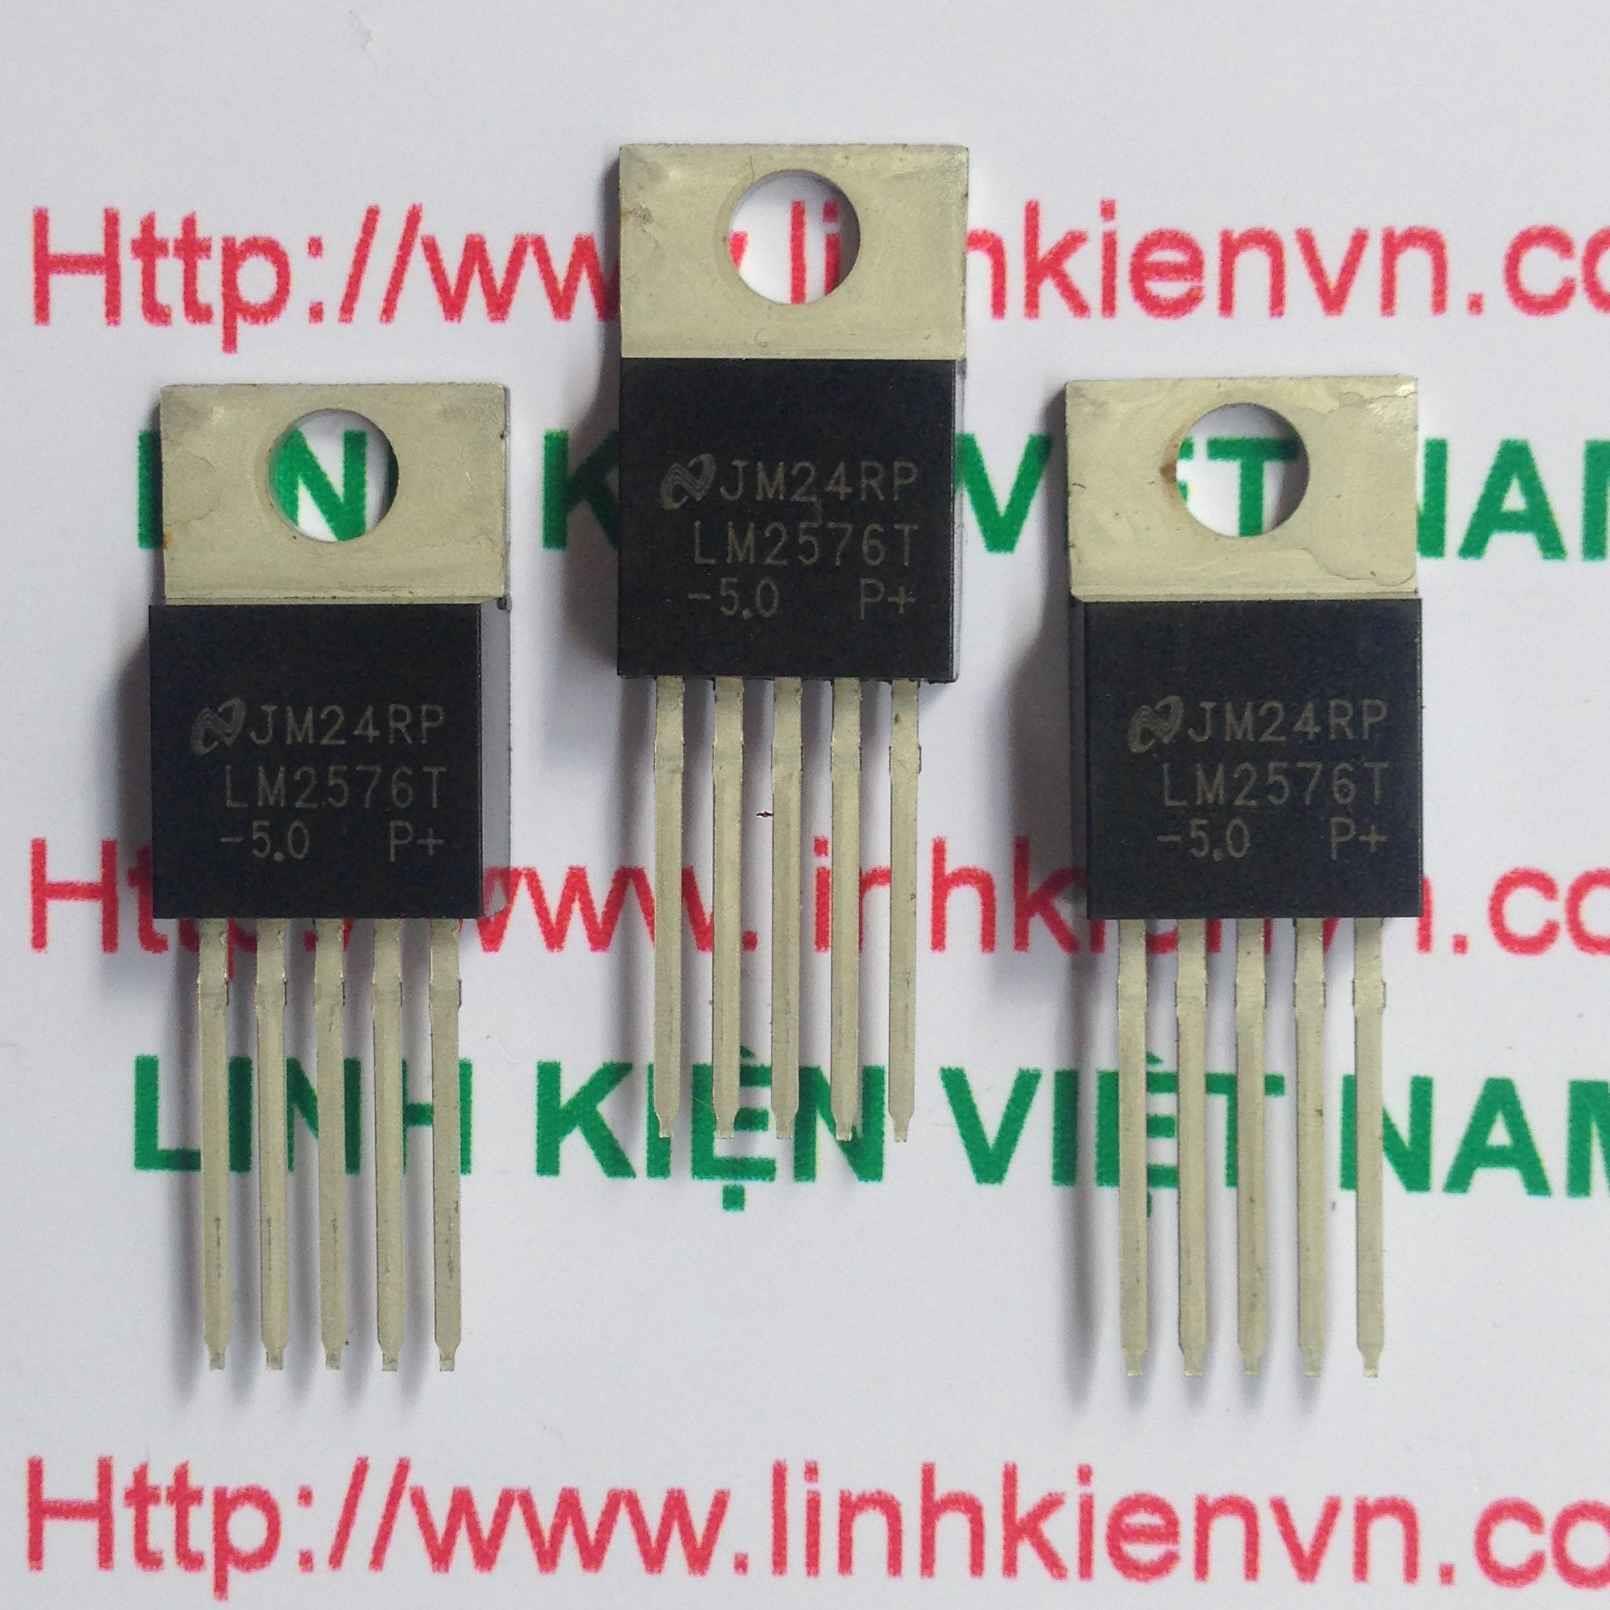 IC nguồn LM2576T - 5V - B4H1